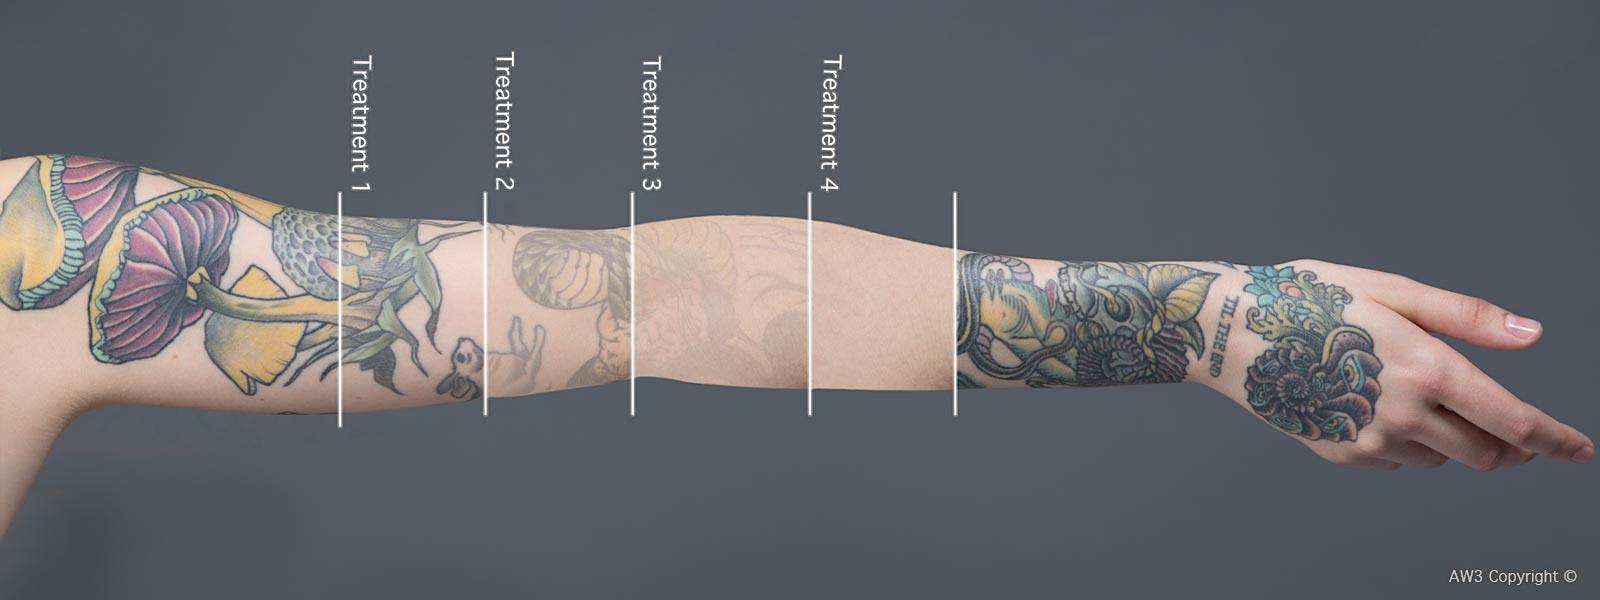 Redink Tattoo Studio Laser Tattoo Removal Free consultation